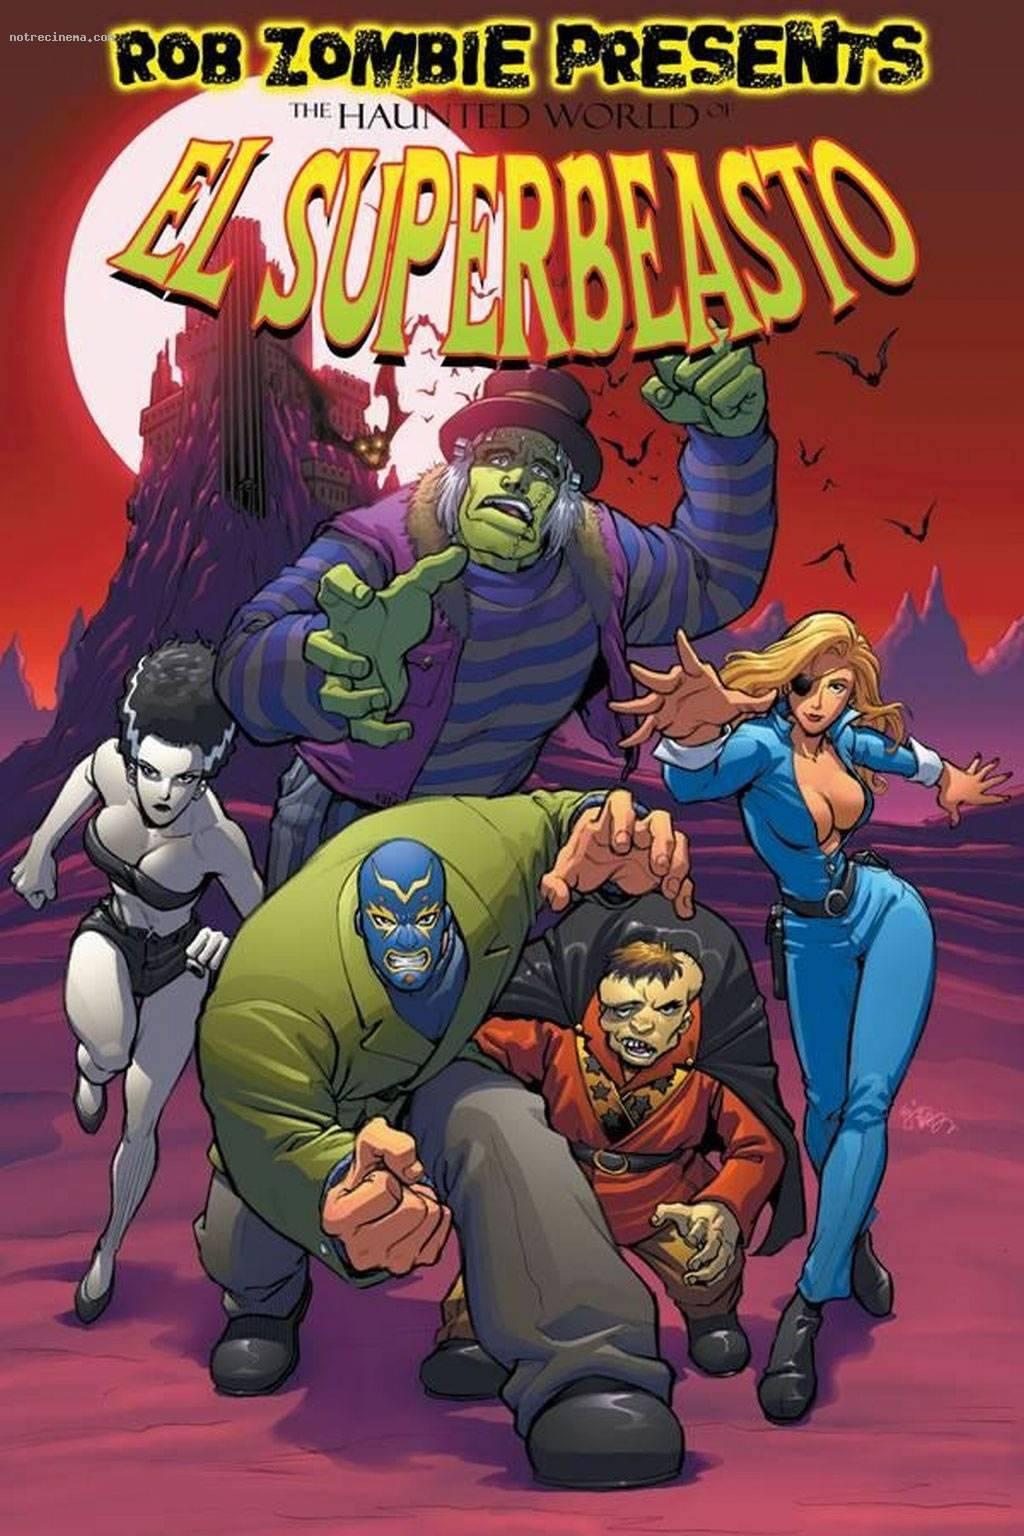 The Haunted World of El Superbeasto - Rob Zombie